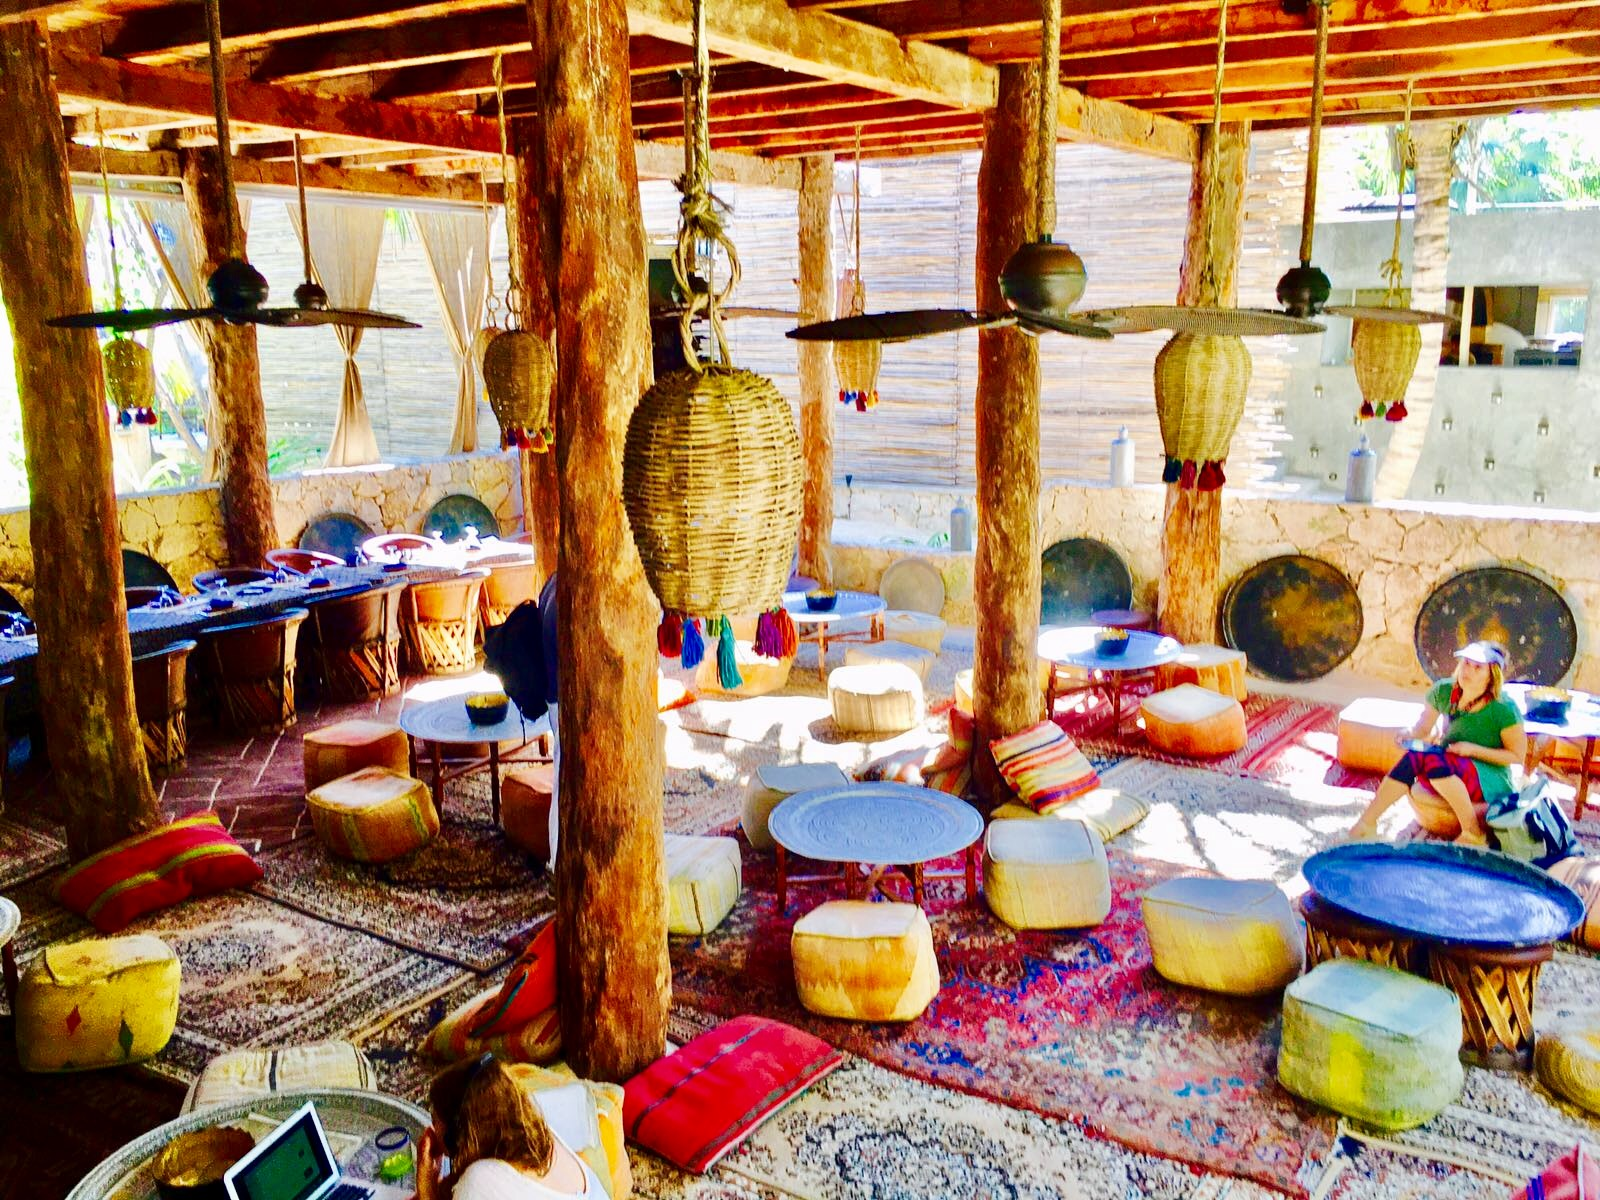 Andrea Emmerich, Nomad Hotel Tulum, Yucatan, Mexico - 3 Days*